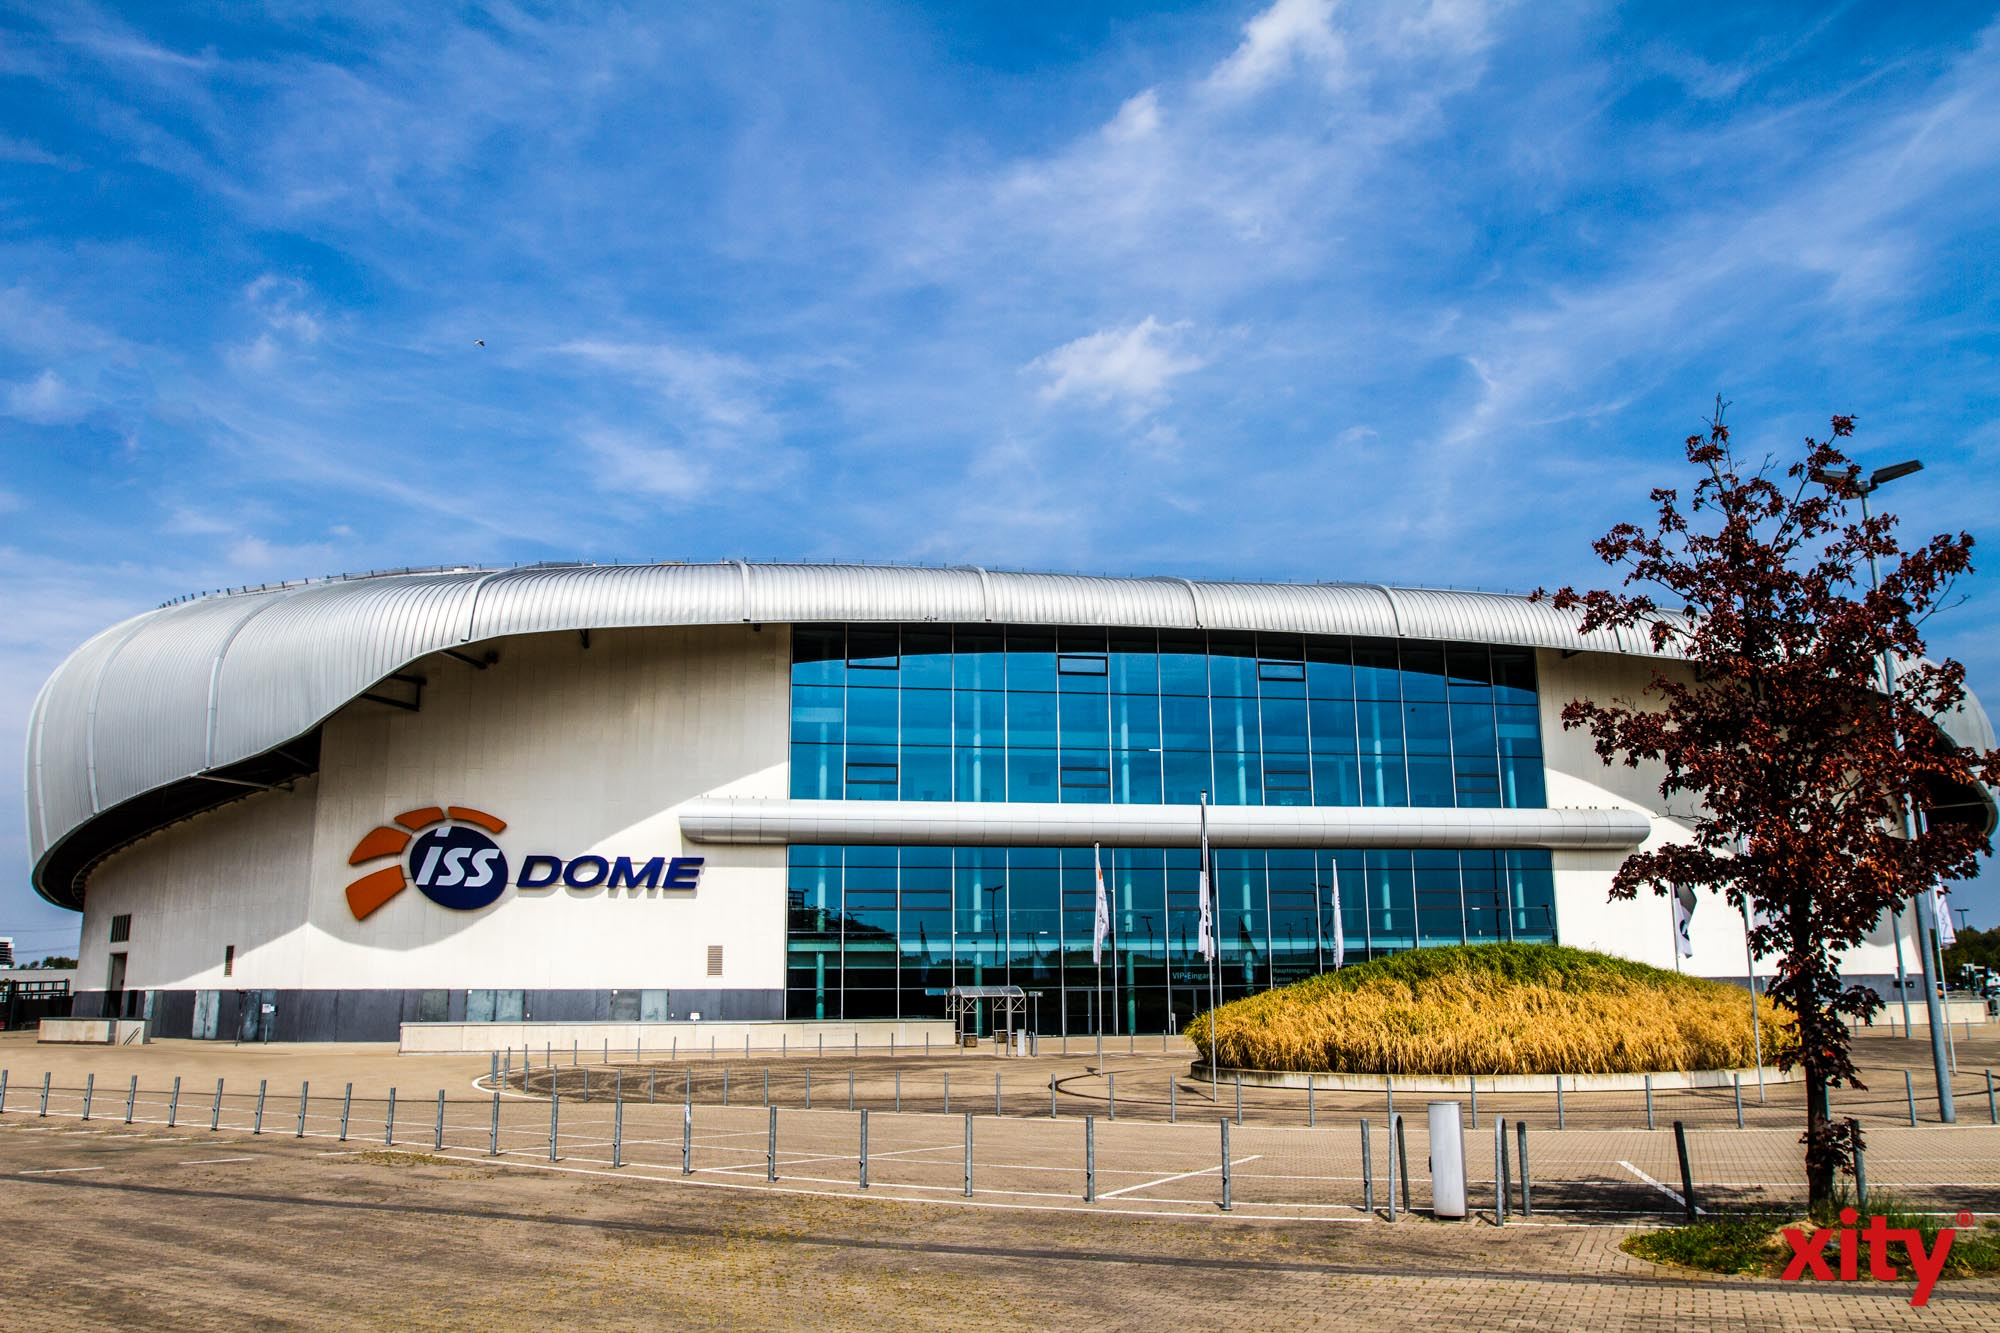 Düsseldorf: Der ISS Dome wird zum PSD Bank Dome(Foto: xity)